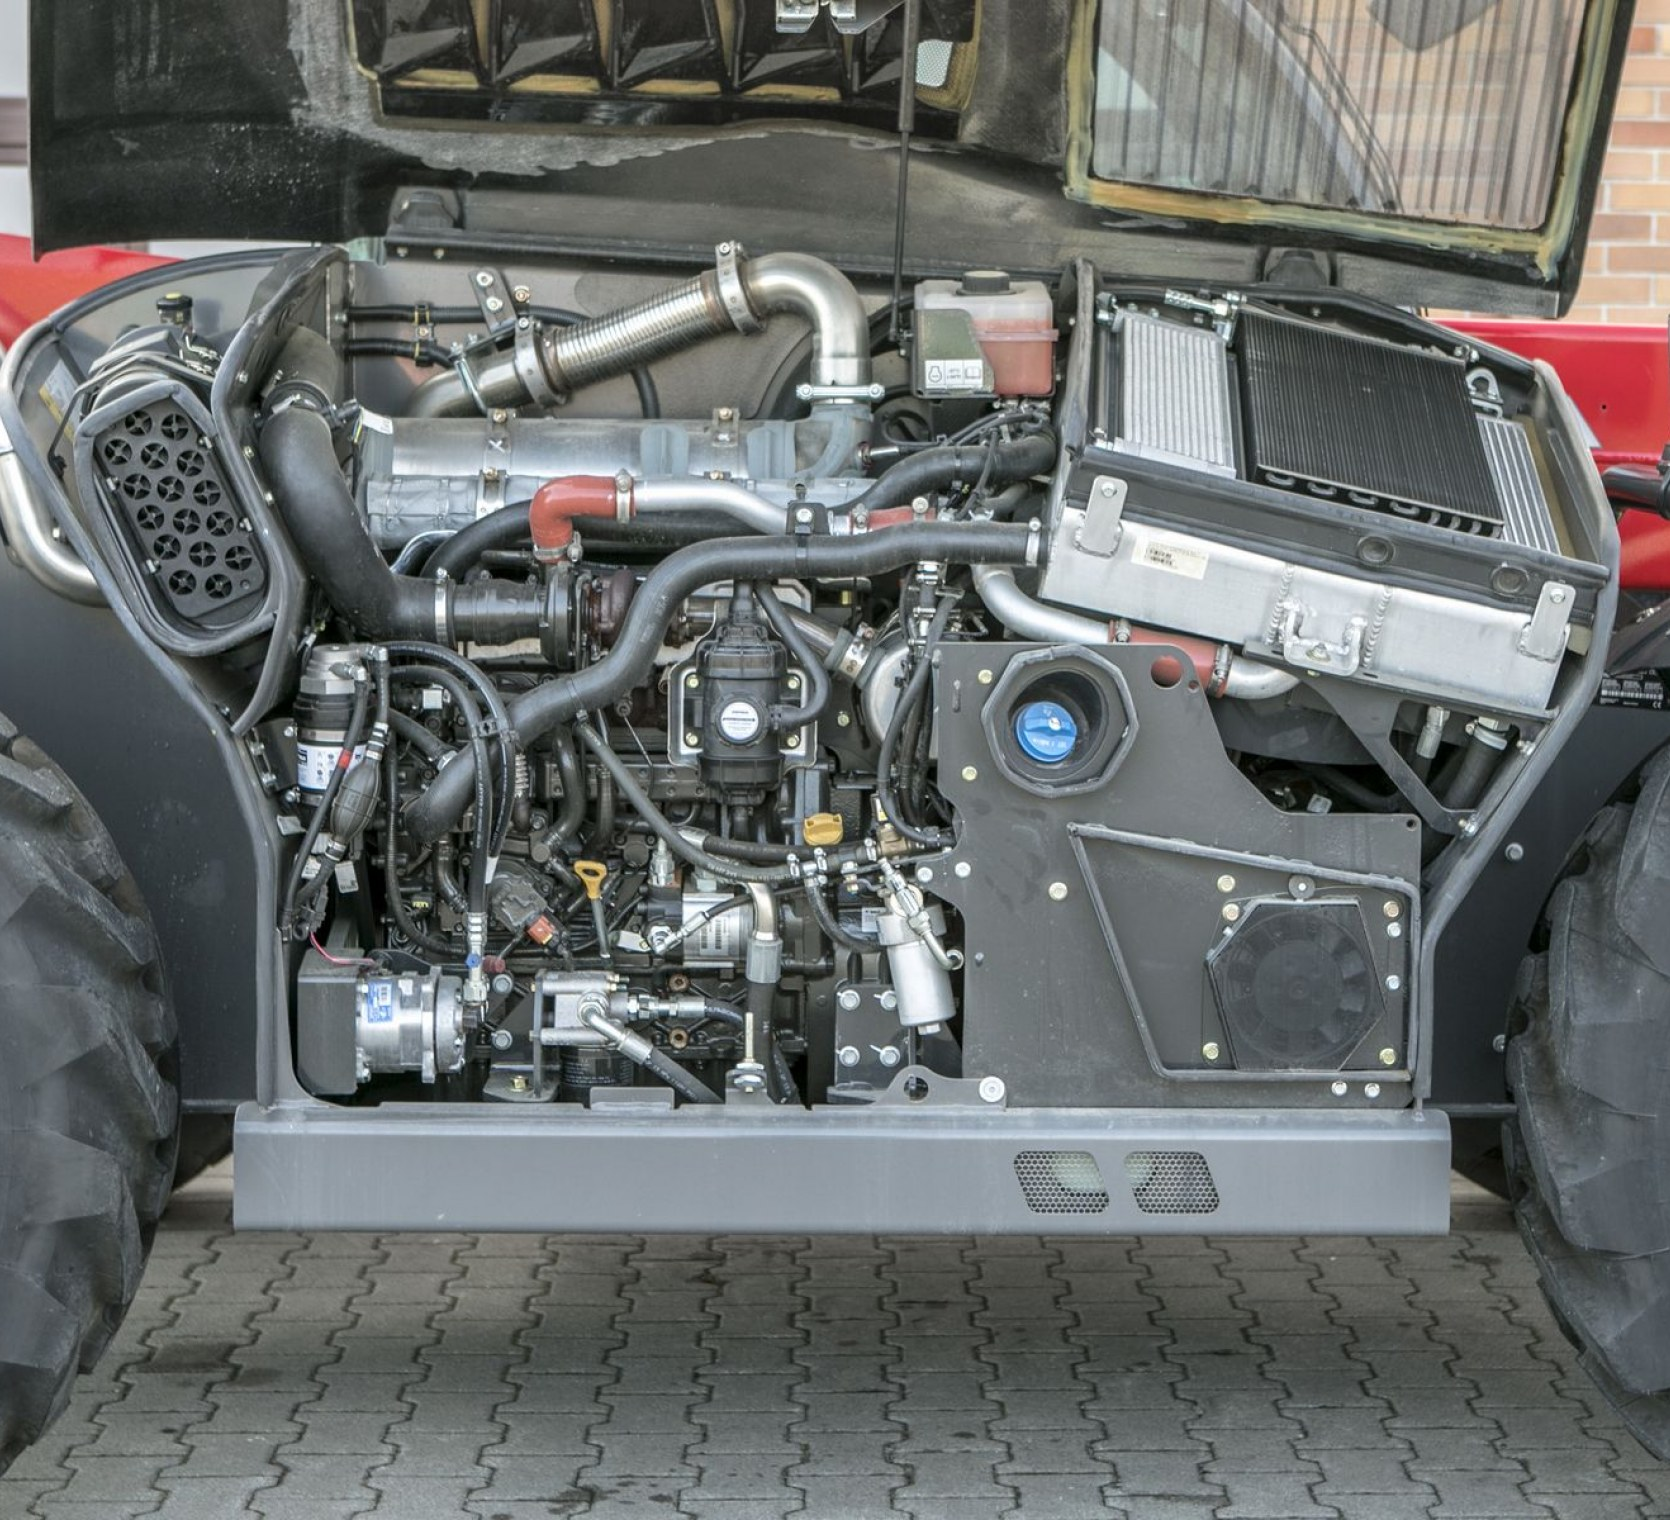 Silnik o mocy 130 KM Tier 4F ładowarki MF model TH 6534 korbanek.pl